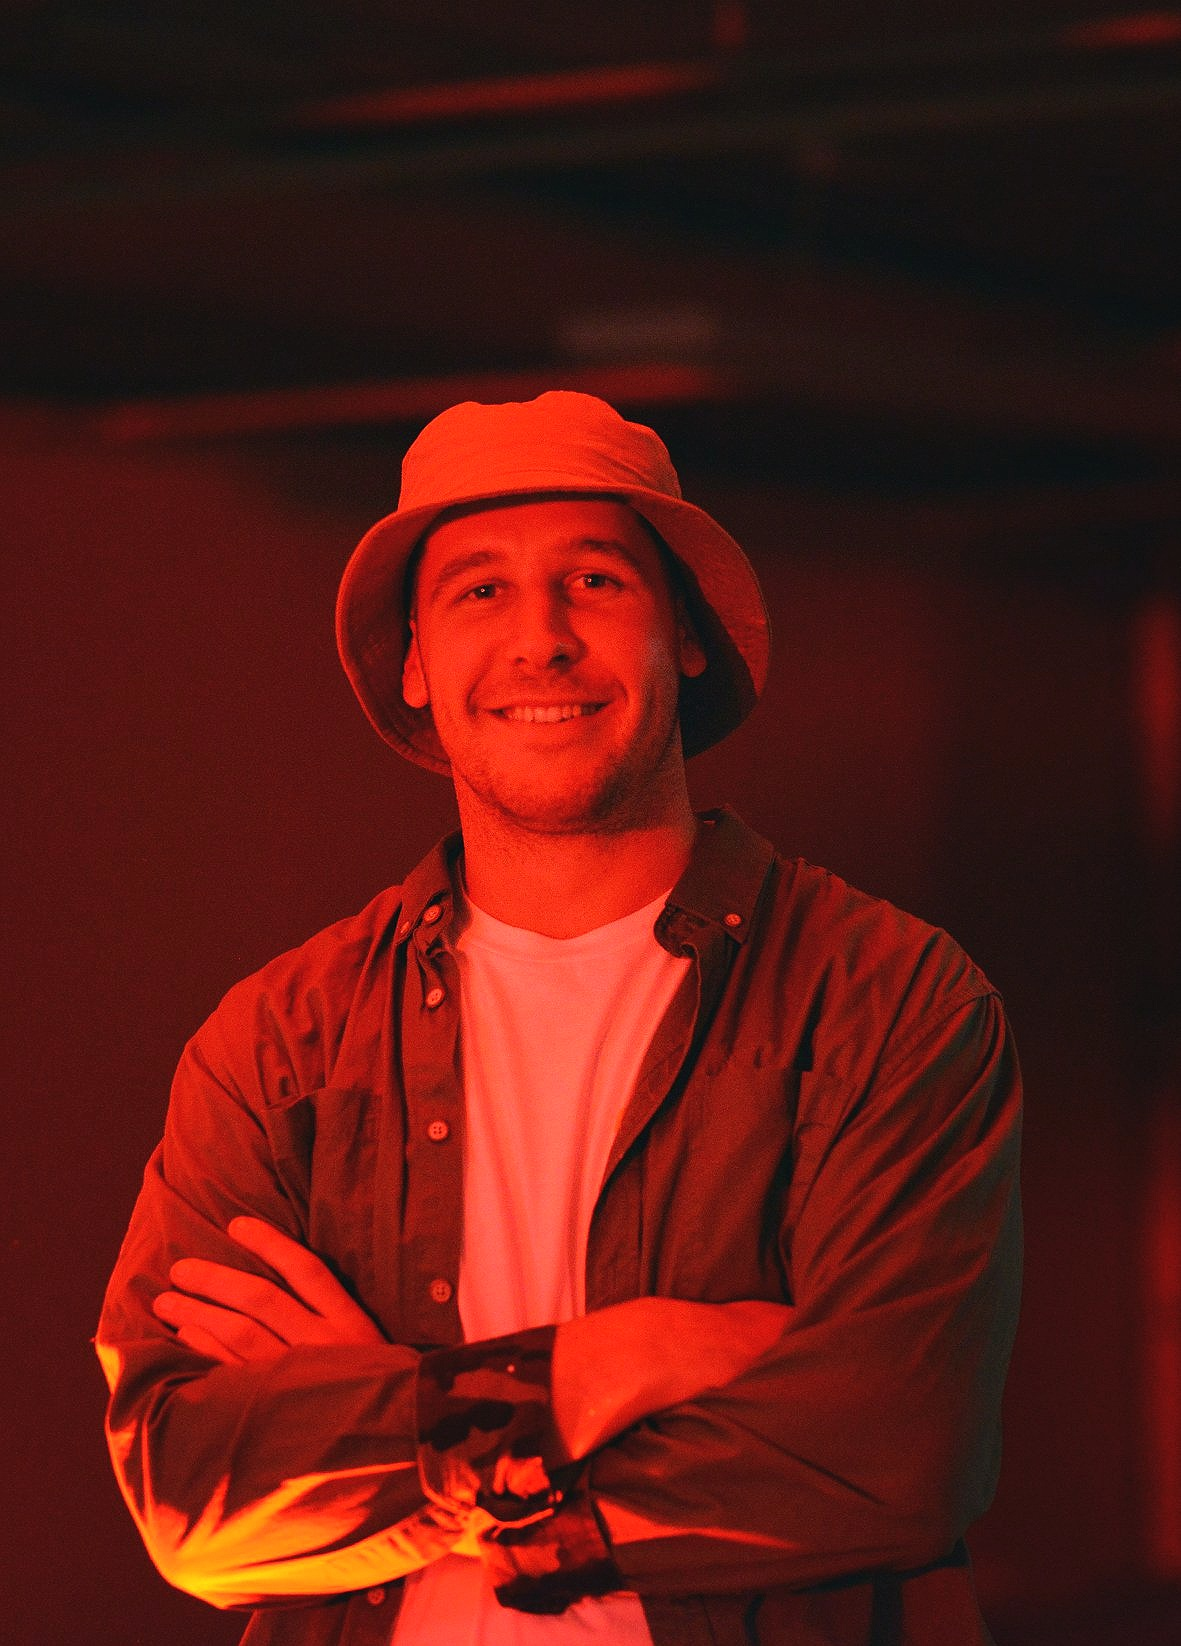 Jonathan at the 'Ōtepoti Hip-Hop Hustle' event for Dunedin Fringe Festival 2019